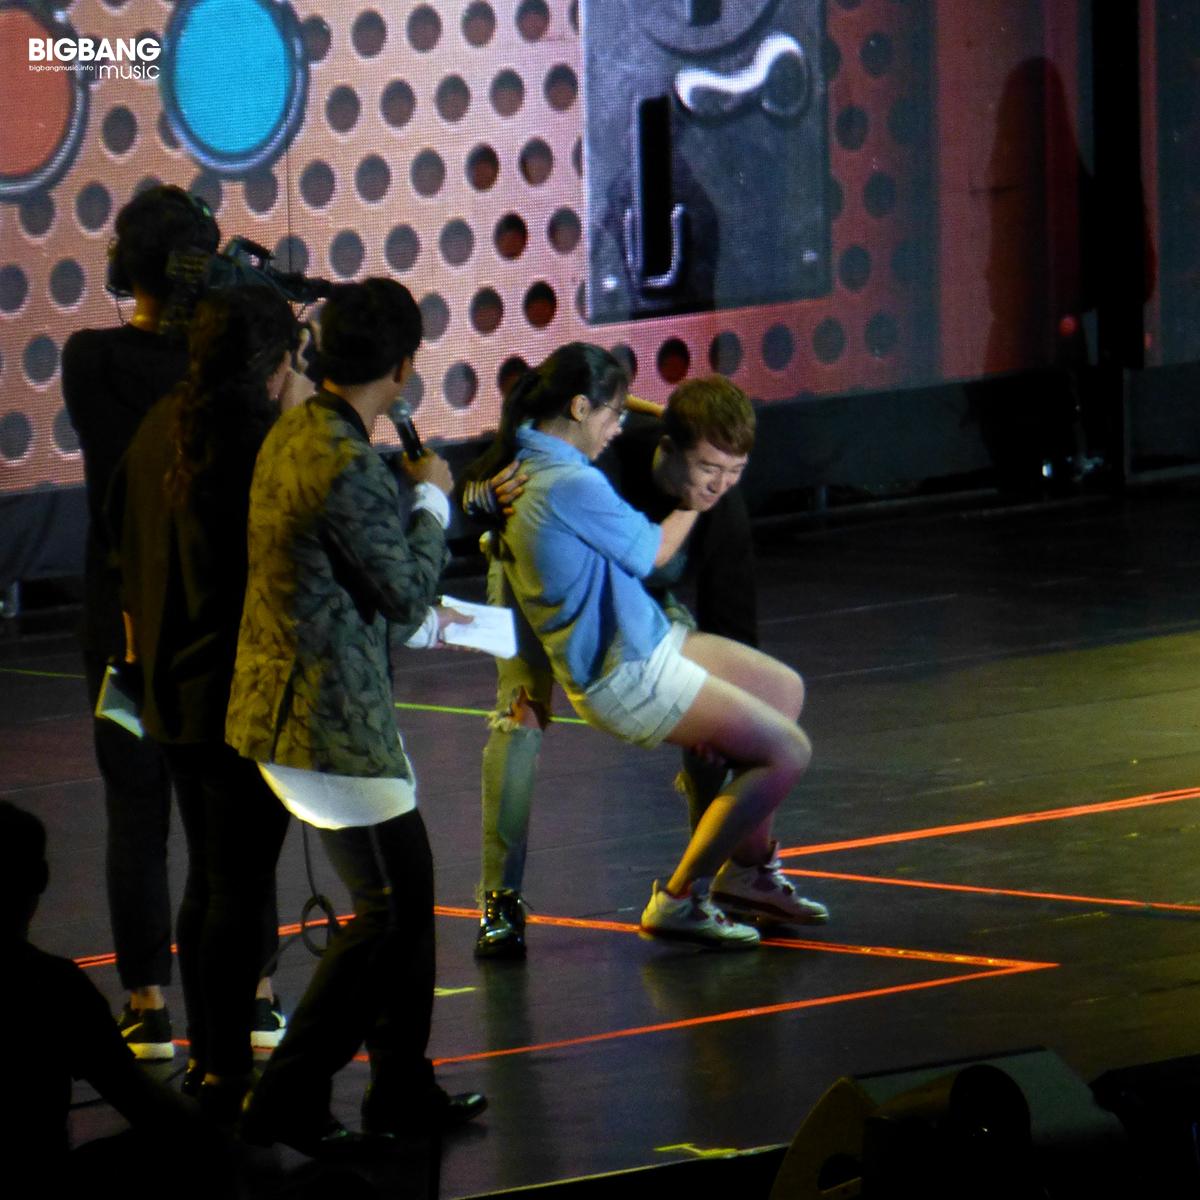 BIGBANGmusic-BIGBANG-FM-Hong-Kong-Day-2-2016-07-23-16